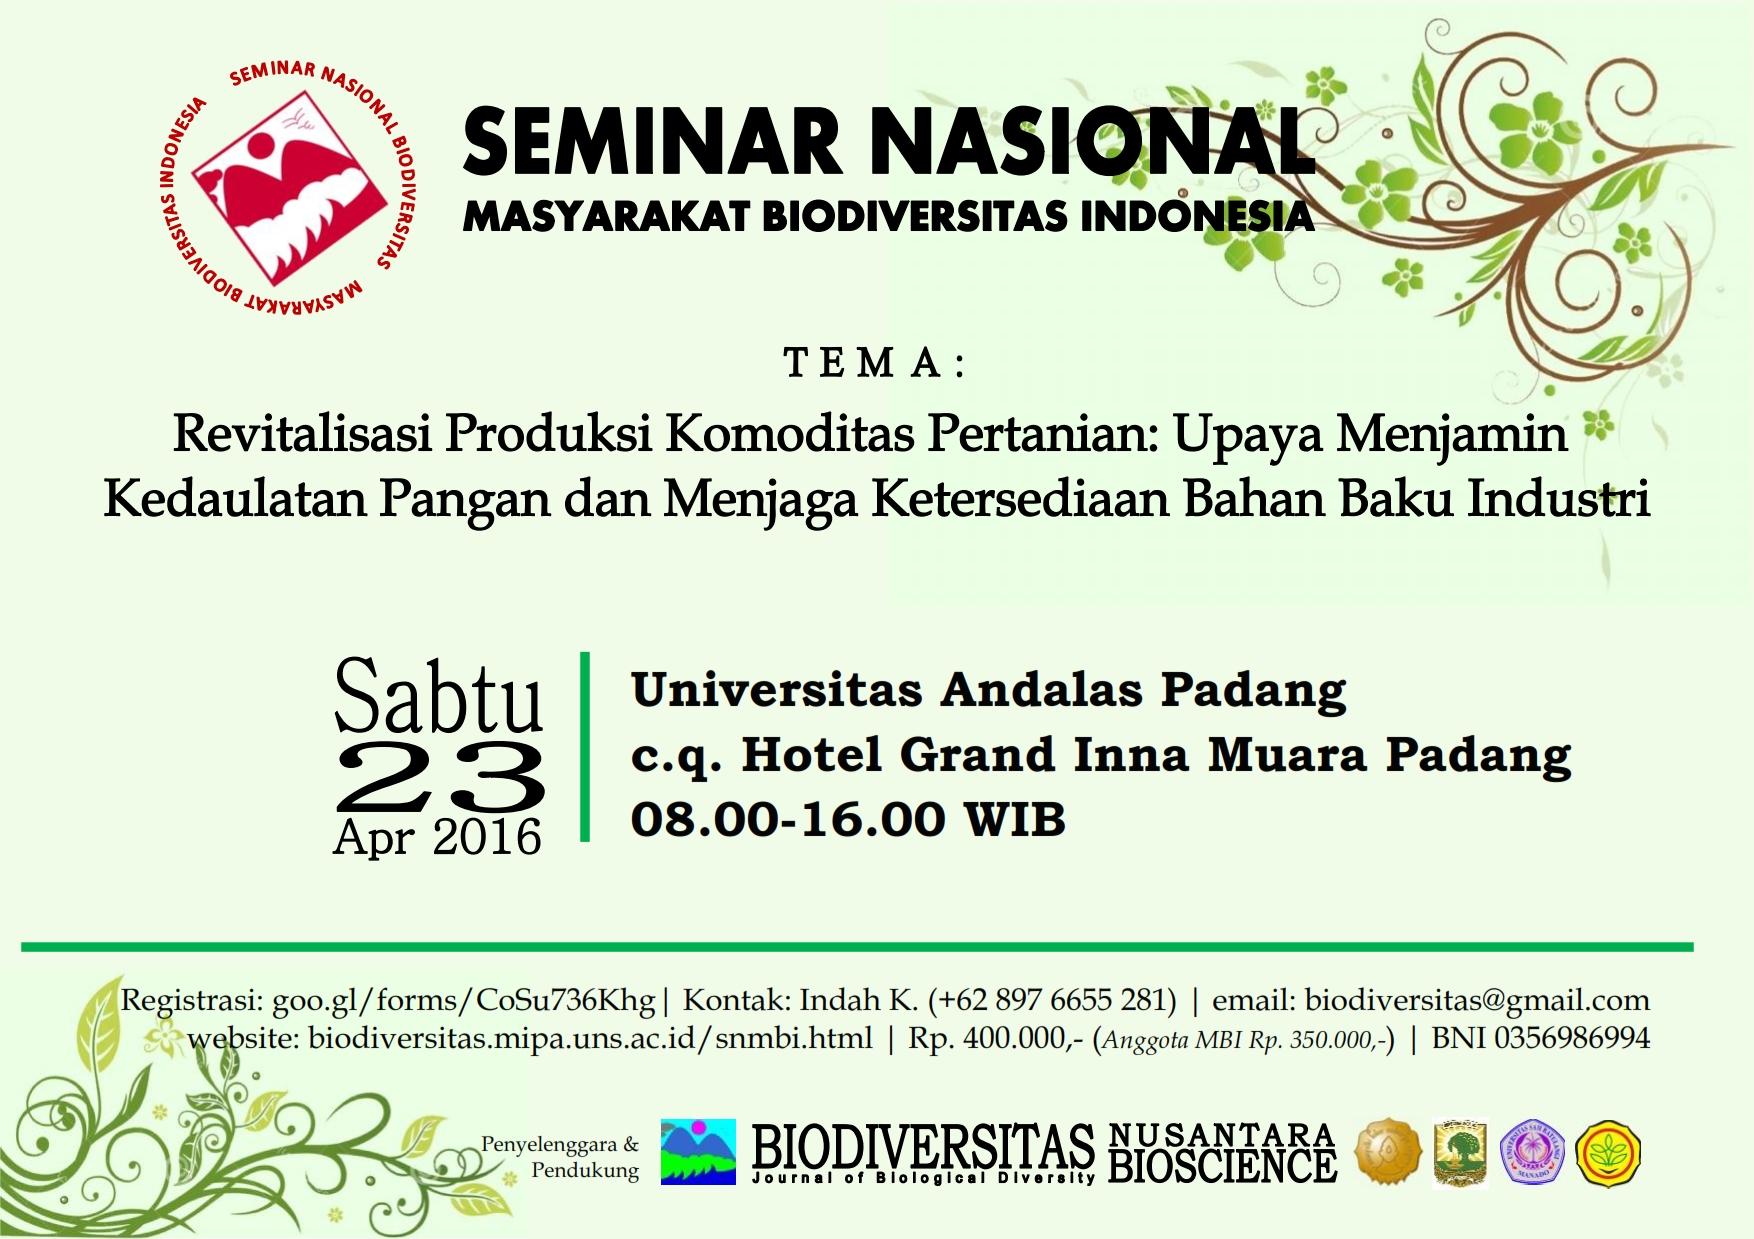 http://biodiversitas.mipa.uns.ac.id/S/2016/padang/images/leafletb.jpg